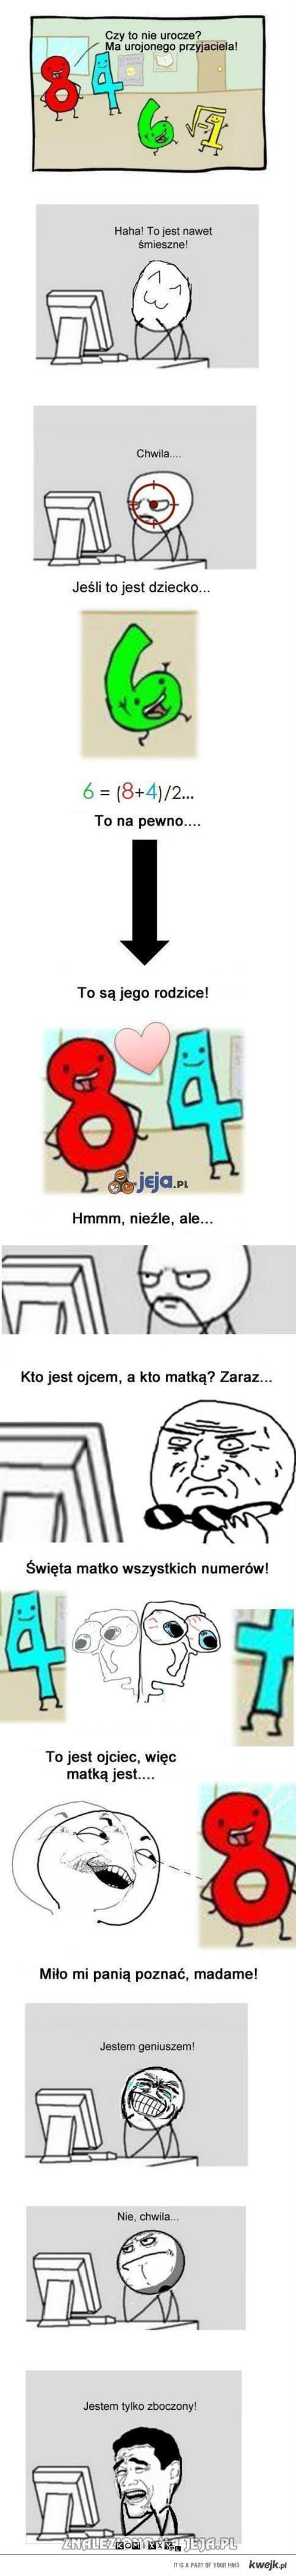 LIczby